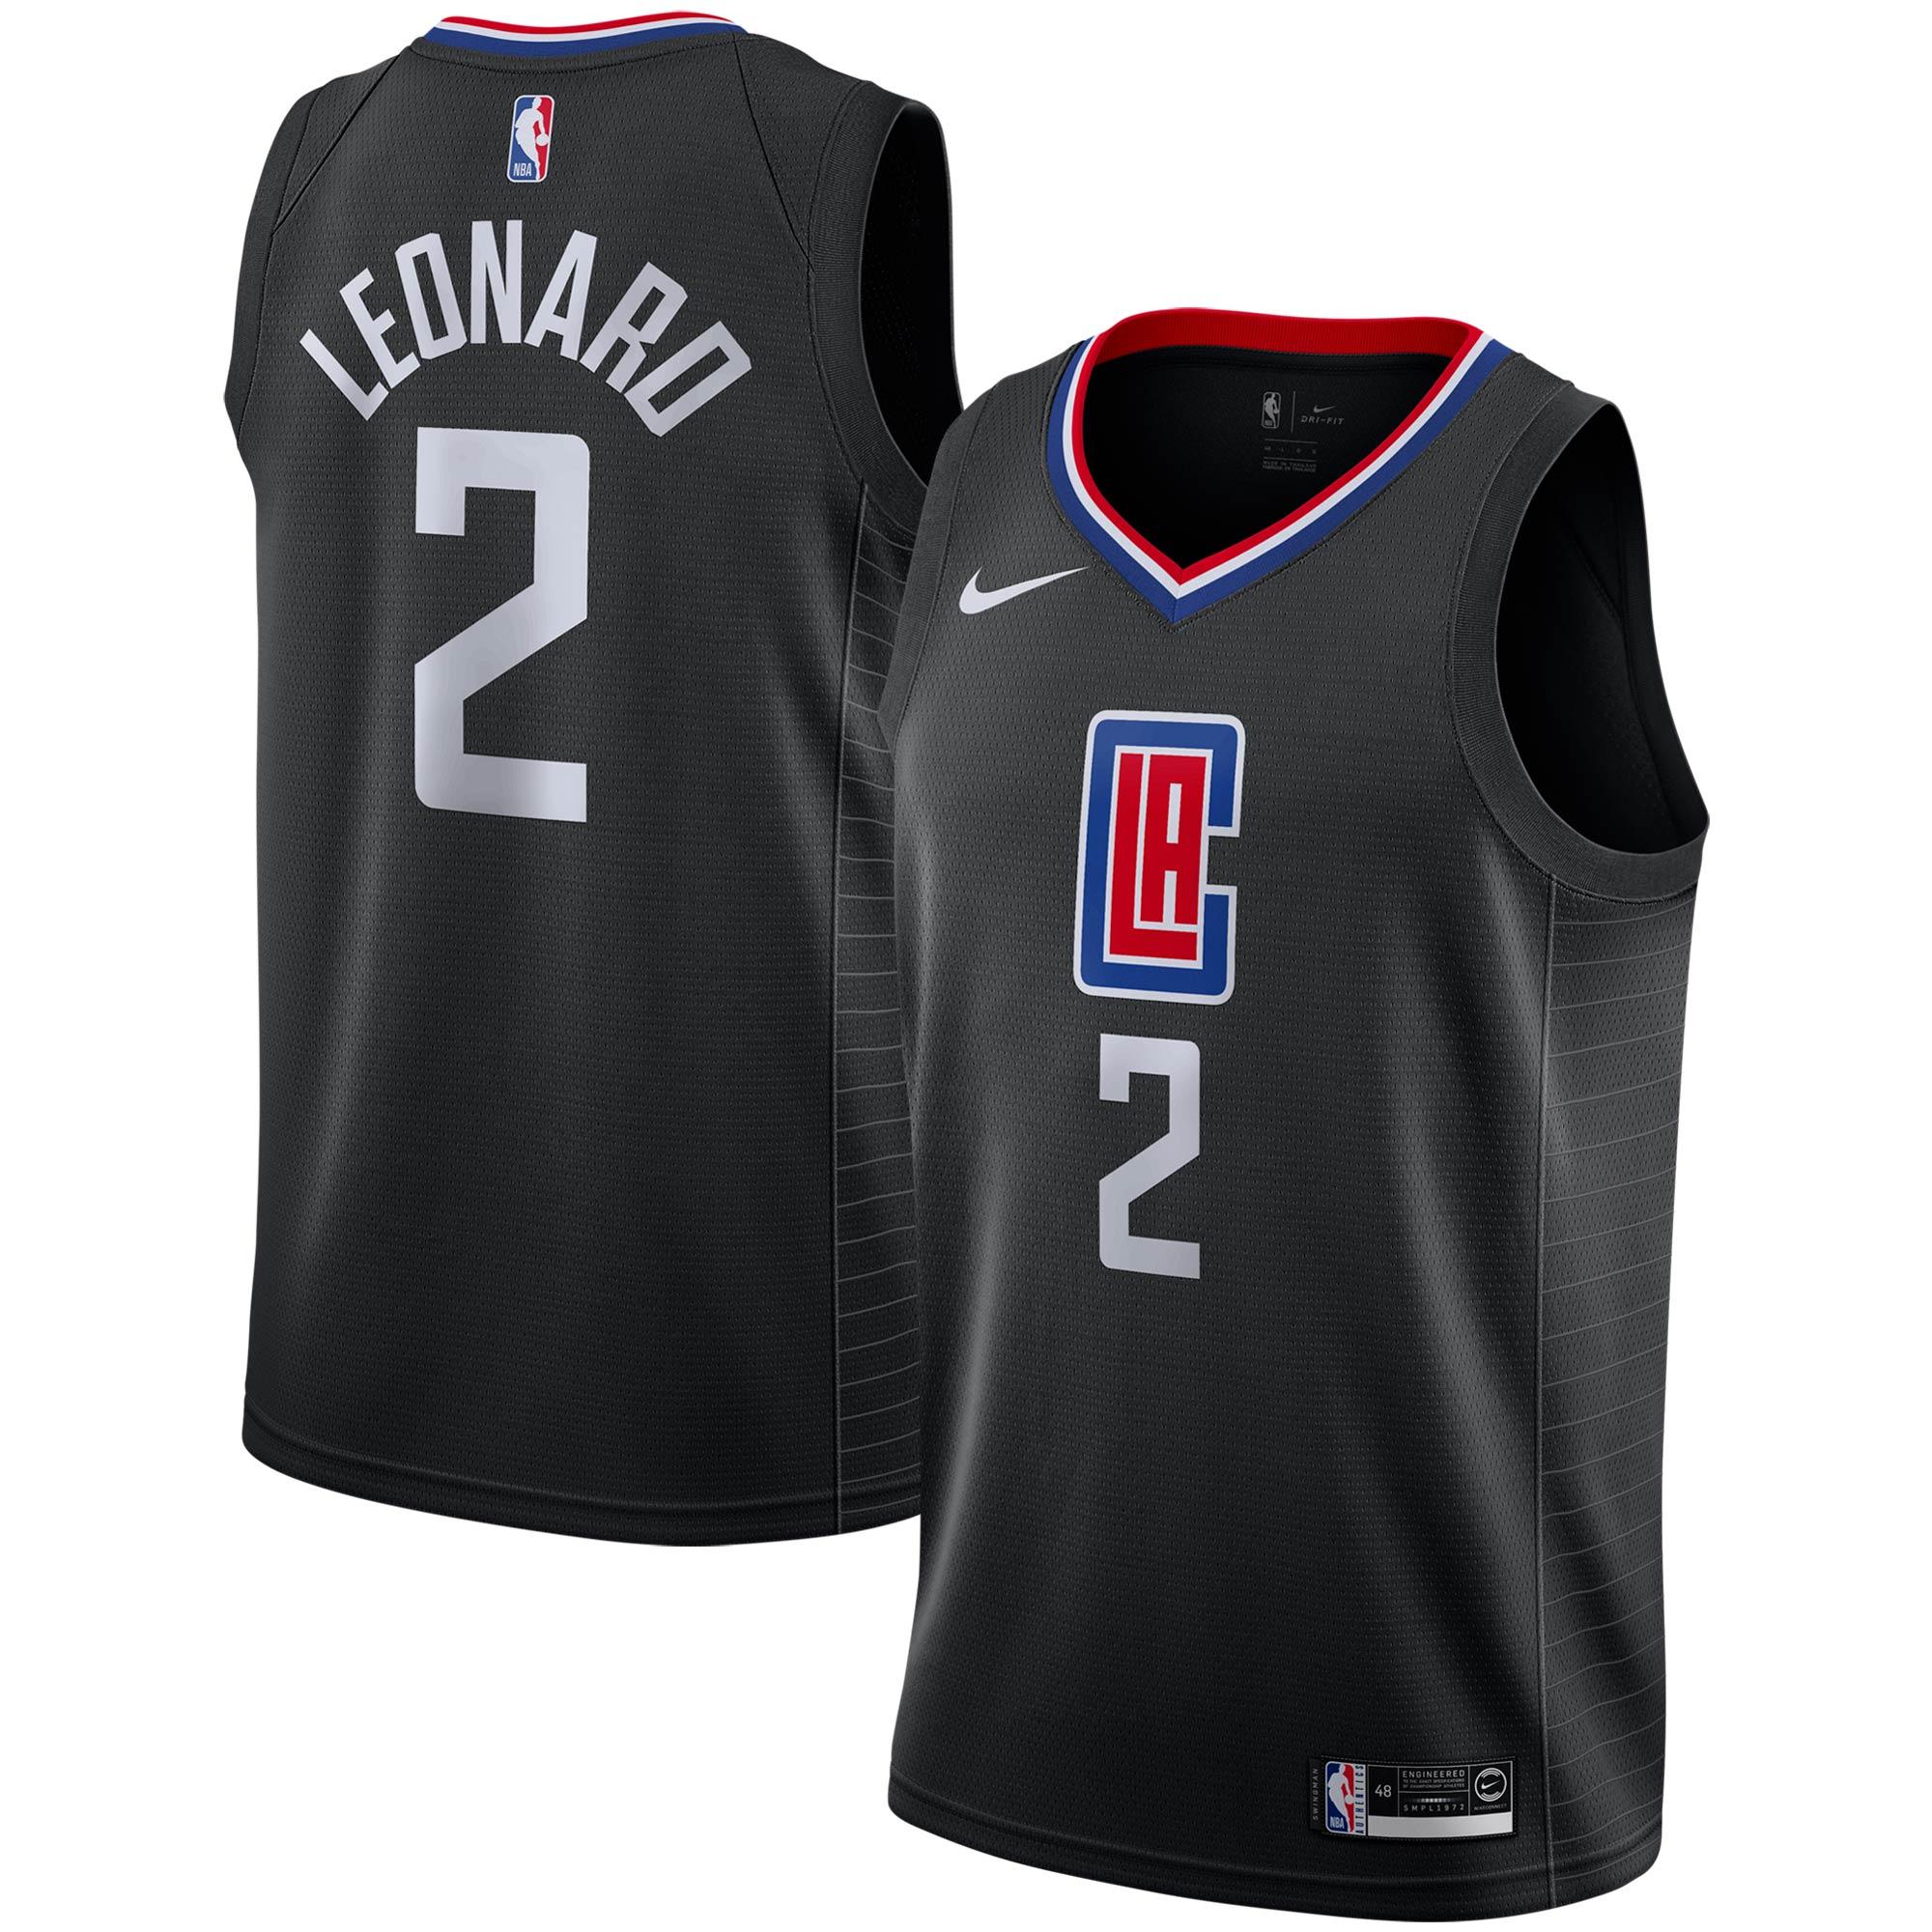 Kawhi Leonard LA Clippers Nike 2019/2020 Swingman Jersey - Statement Edition - Black